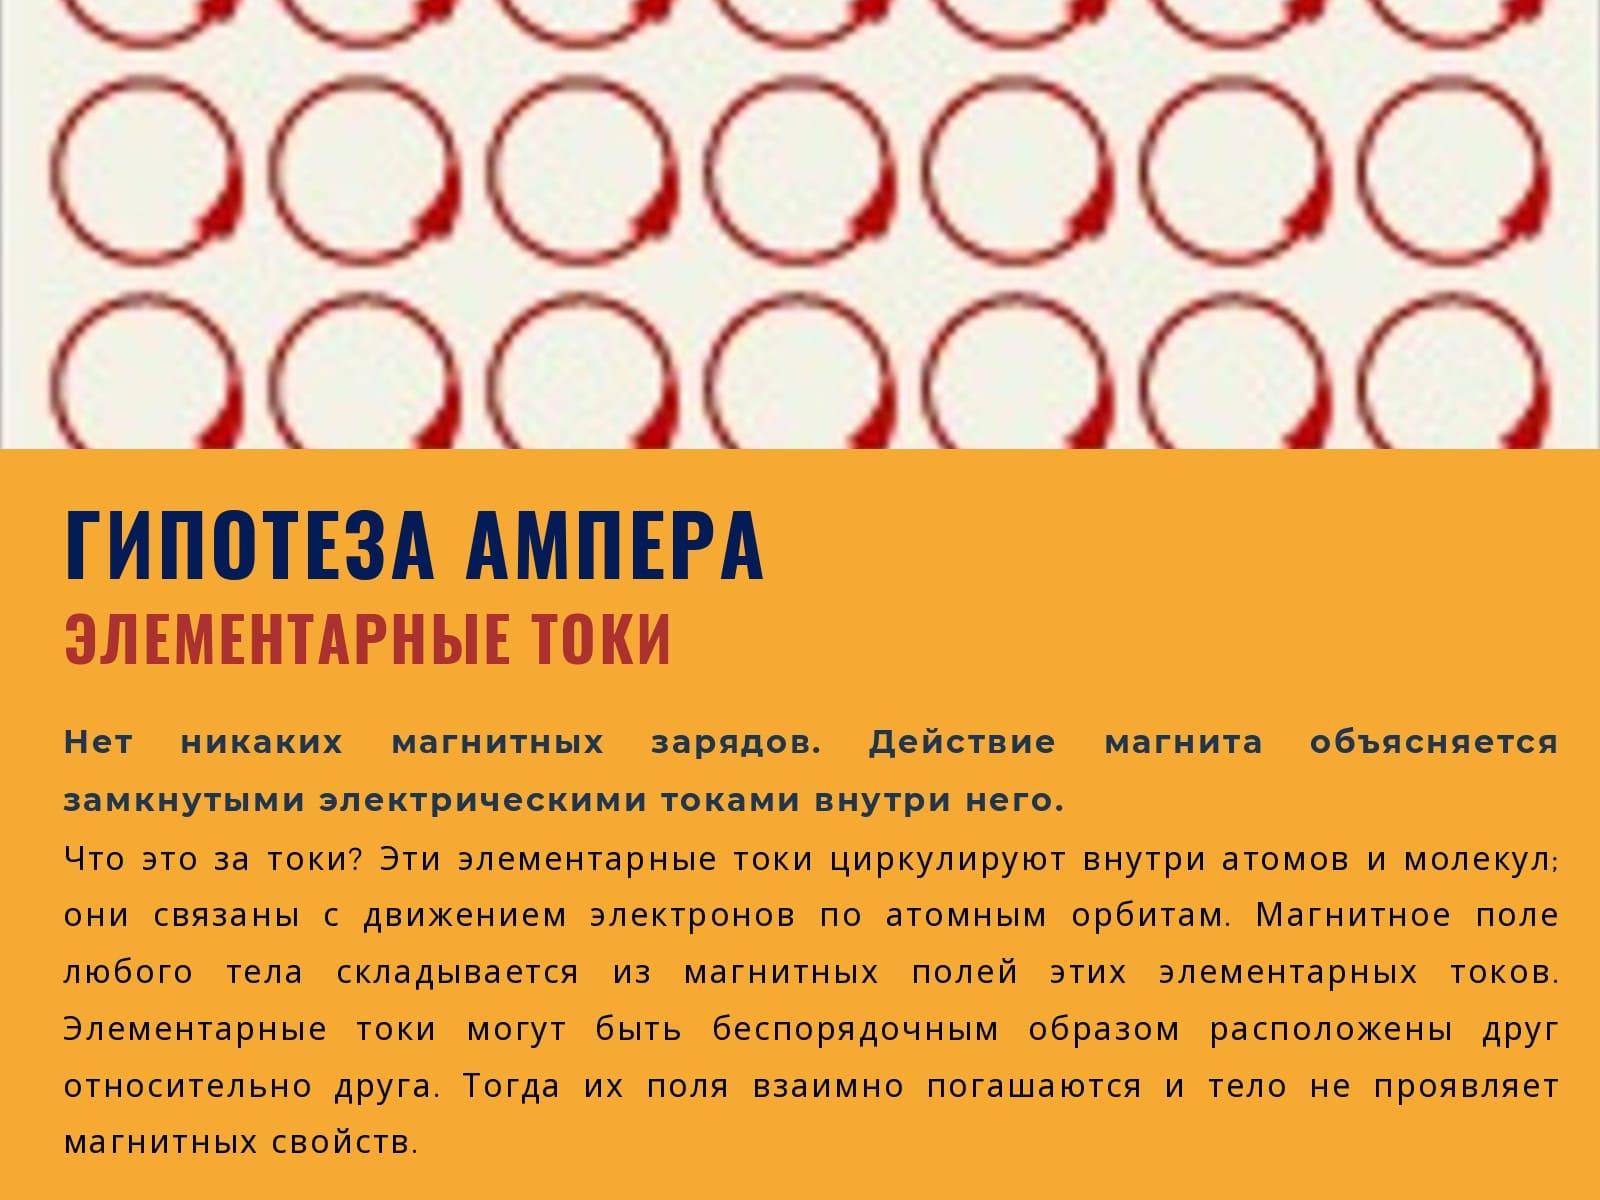 гипотеза ампера. элементарные токи